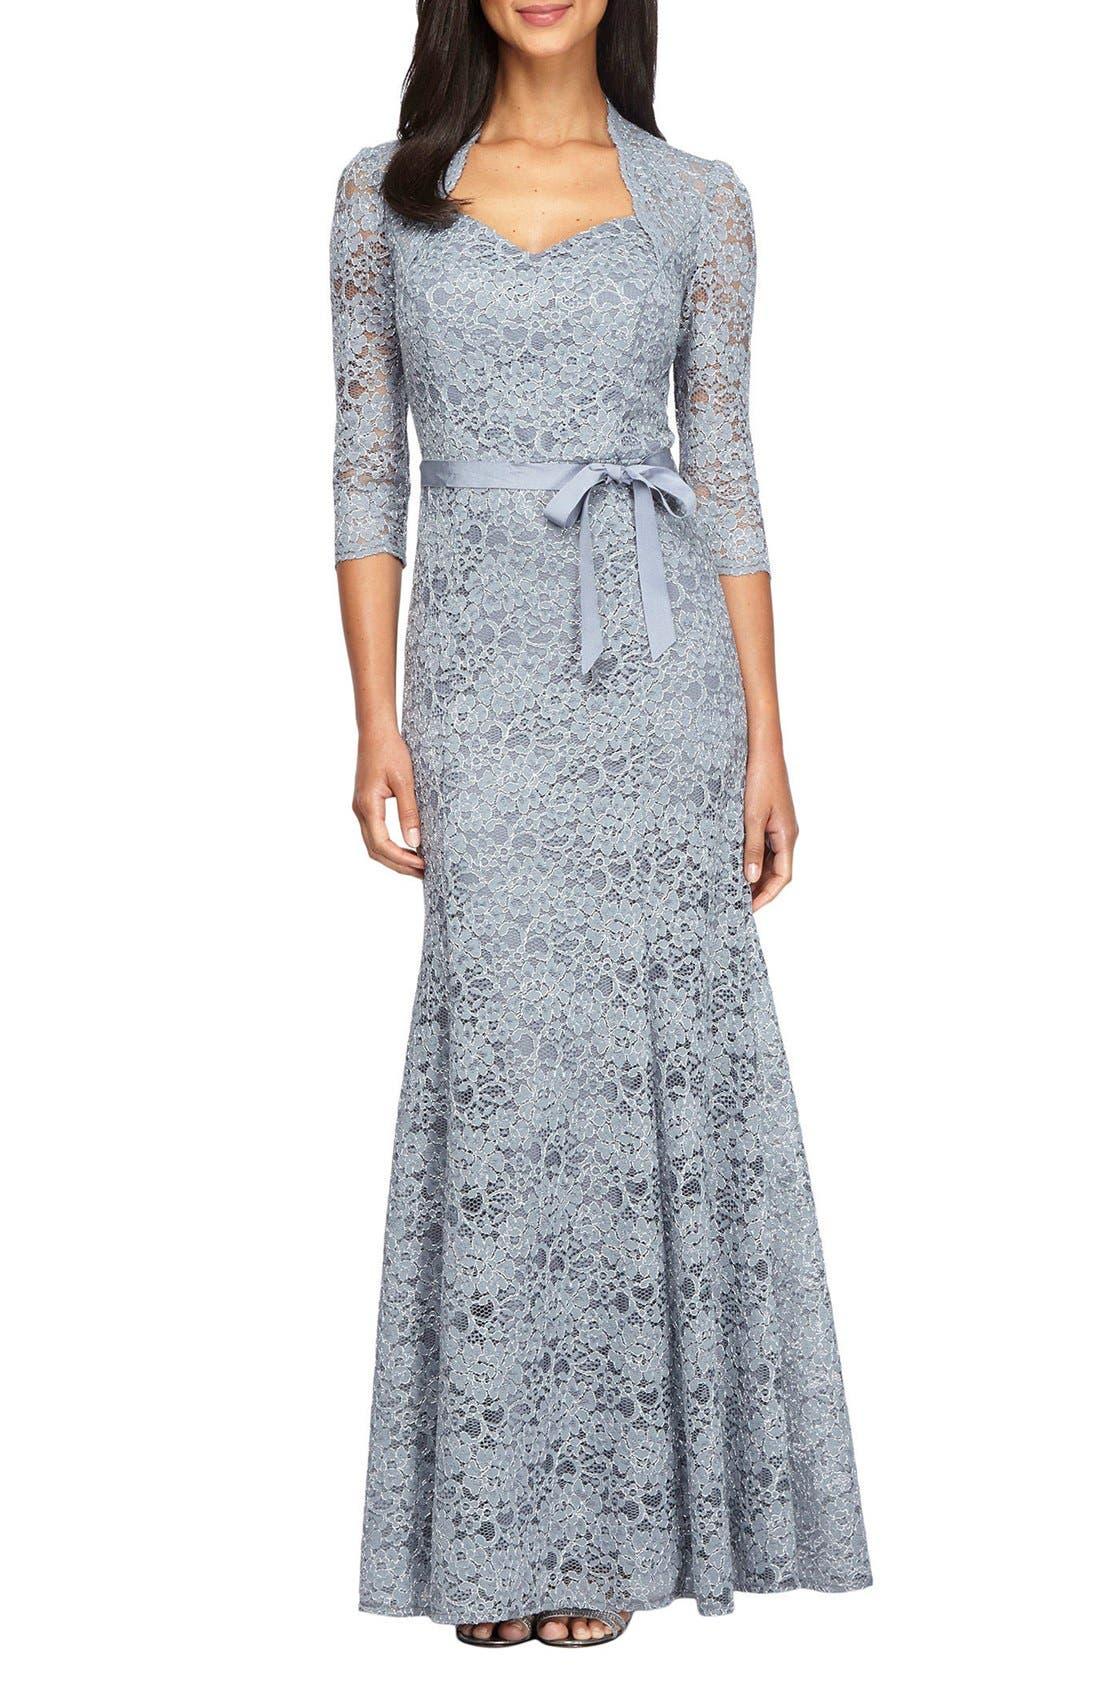 Alternate Image 1 Selected - Alex Evenings Metallic Lace Fit & Flare Gown (Regular & Petite)